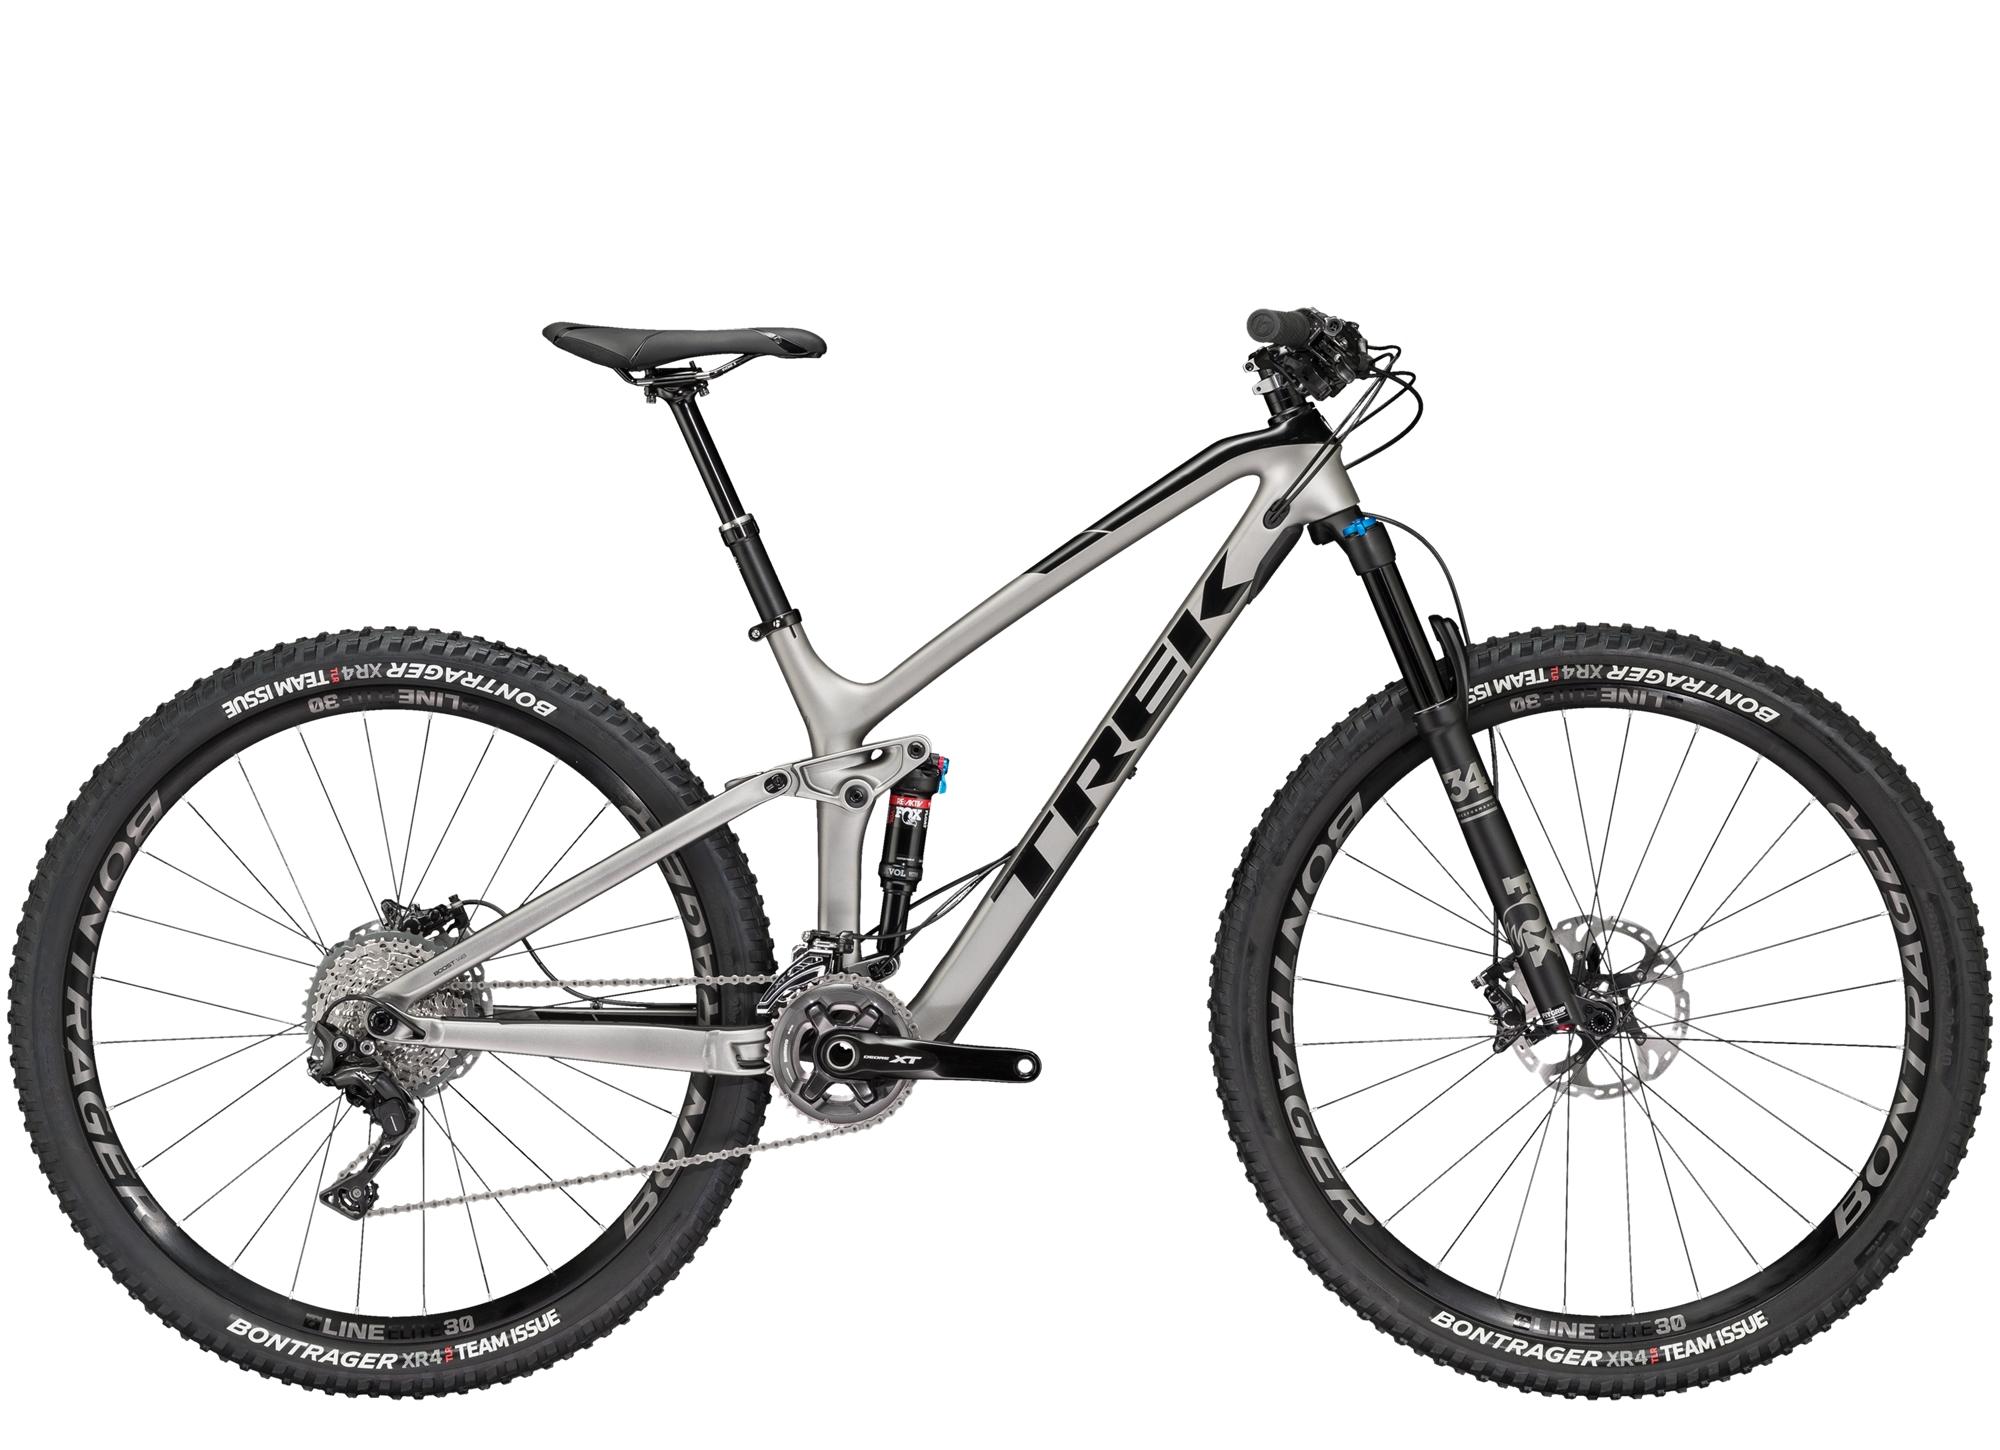 Trek Fuel EX 9.8 29 XT